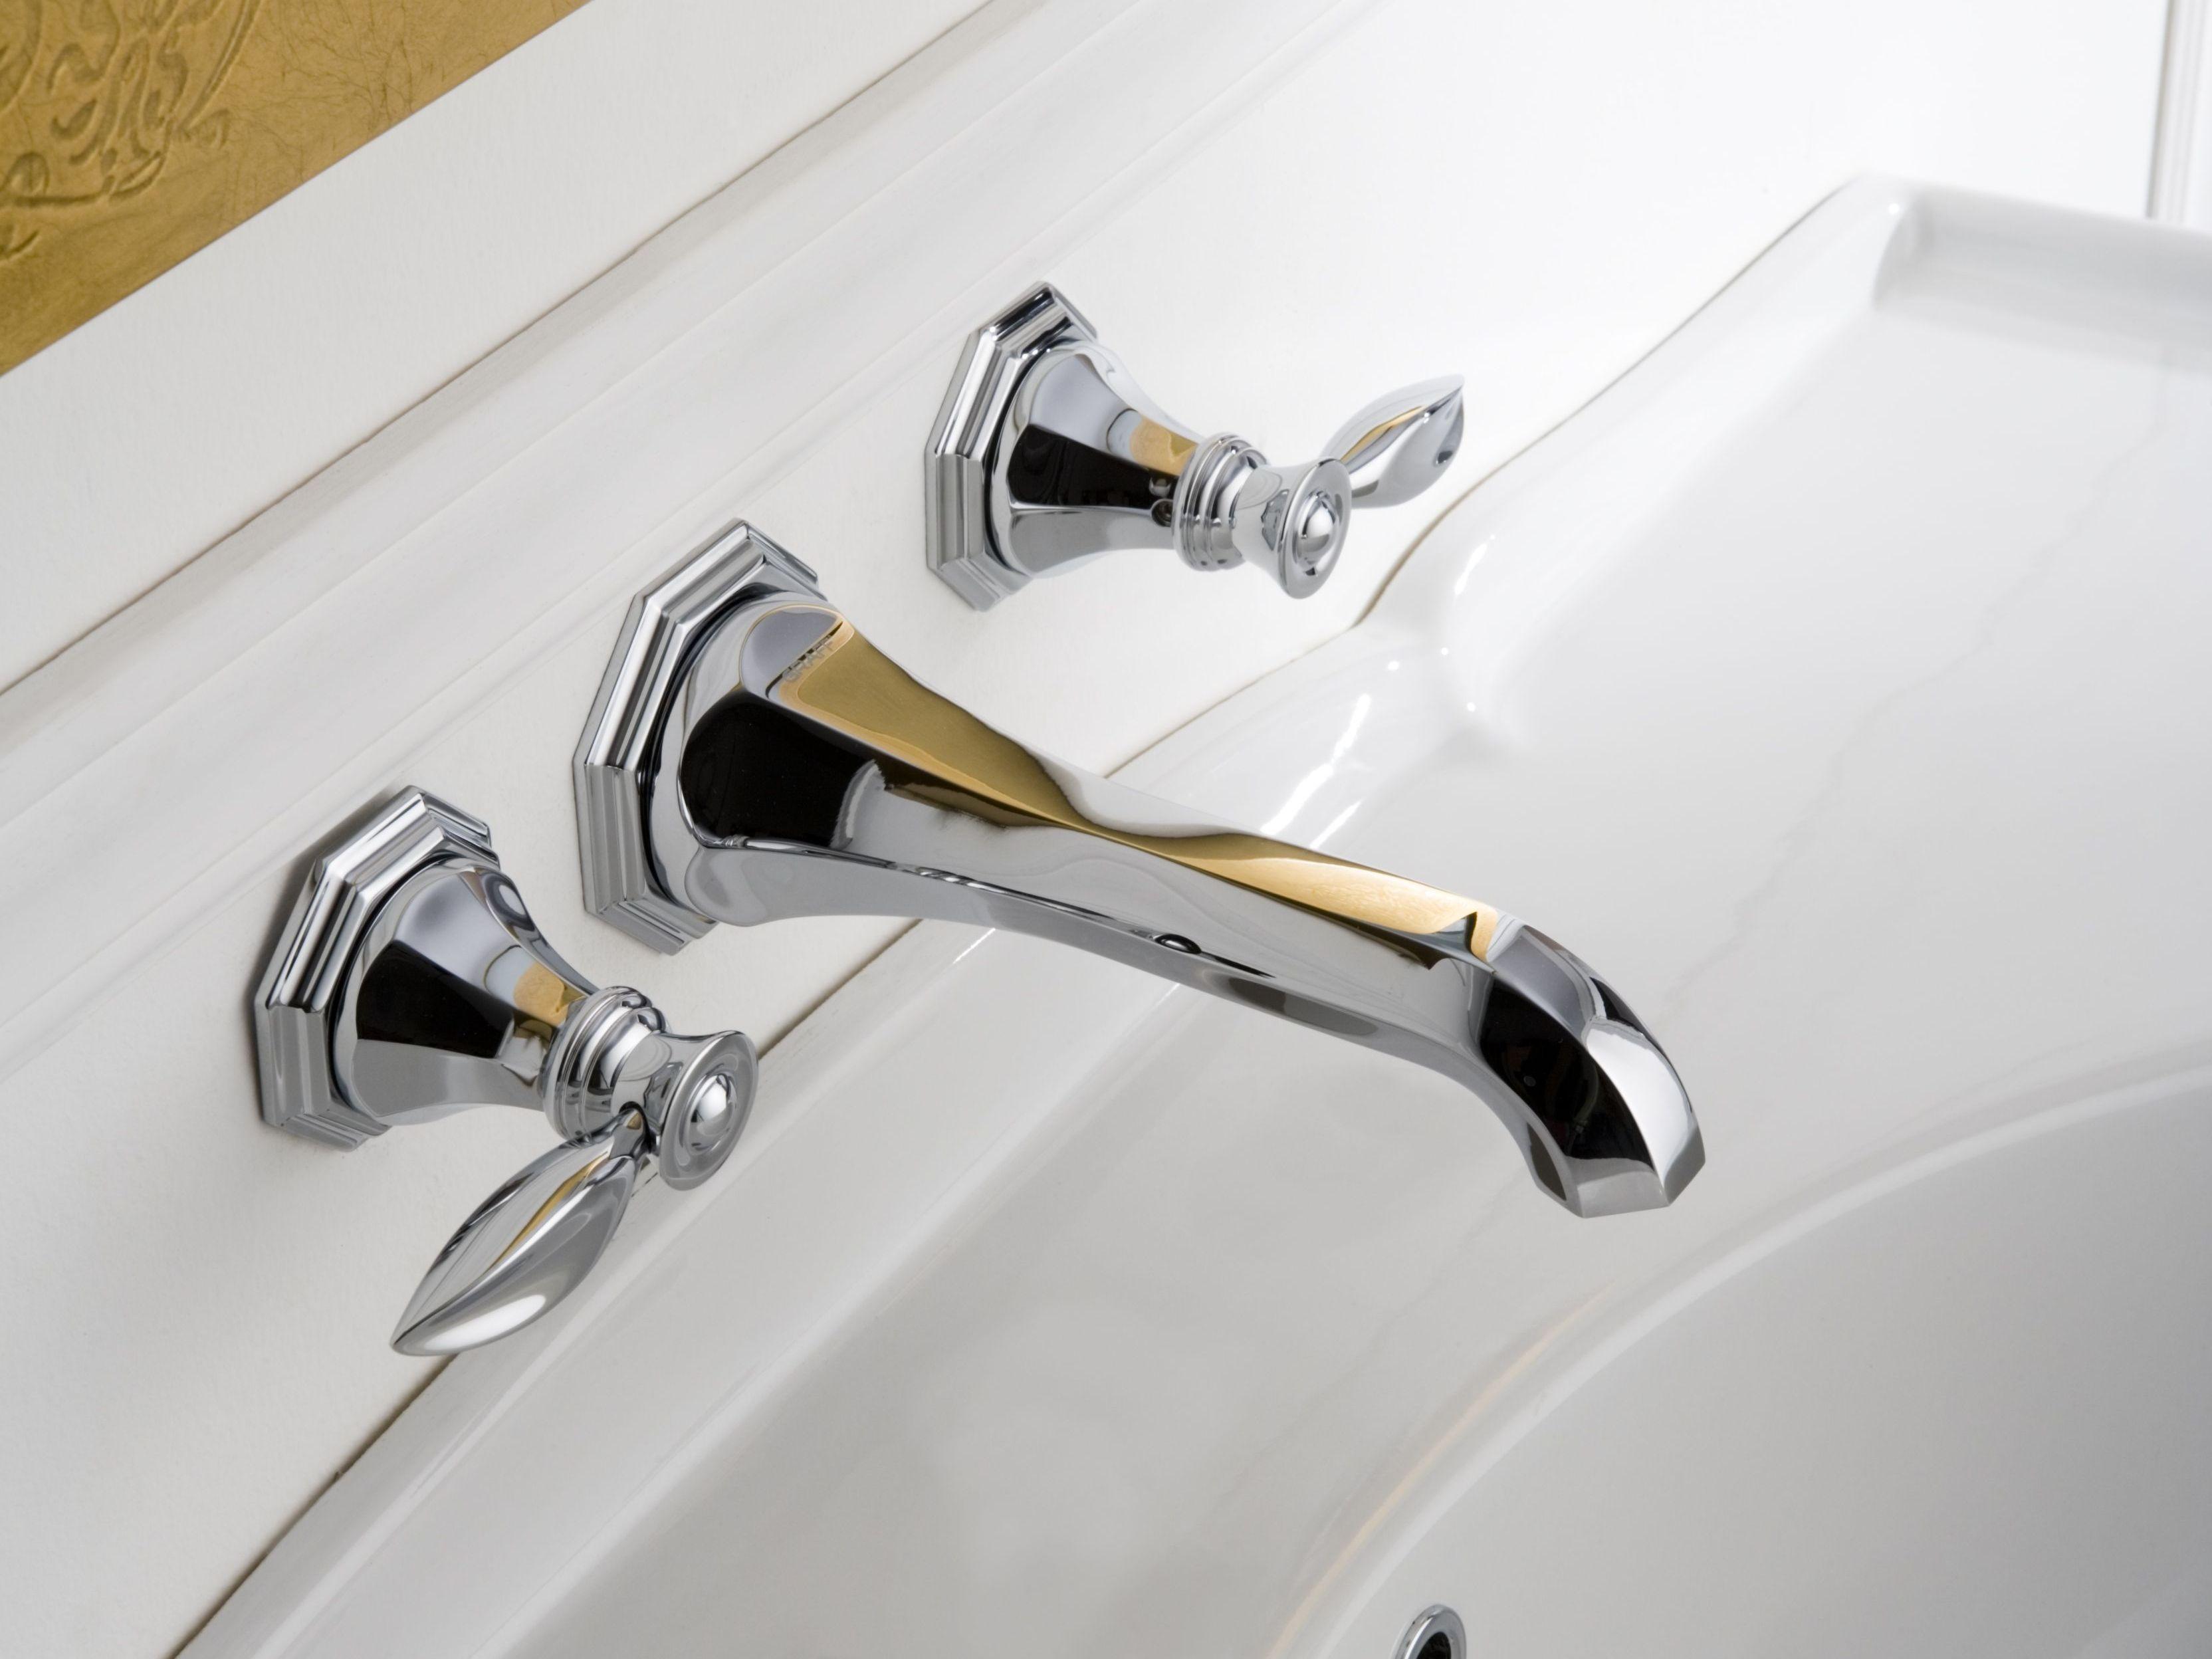 topaz robinet pour lavabo mural by graff europe west. Black Bedroom Furniture Sets. Home Design Ideas